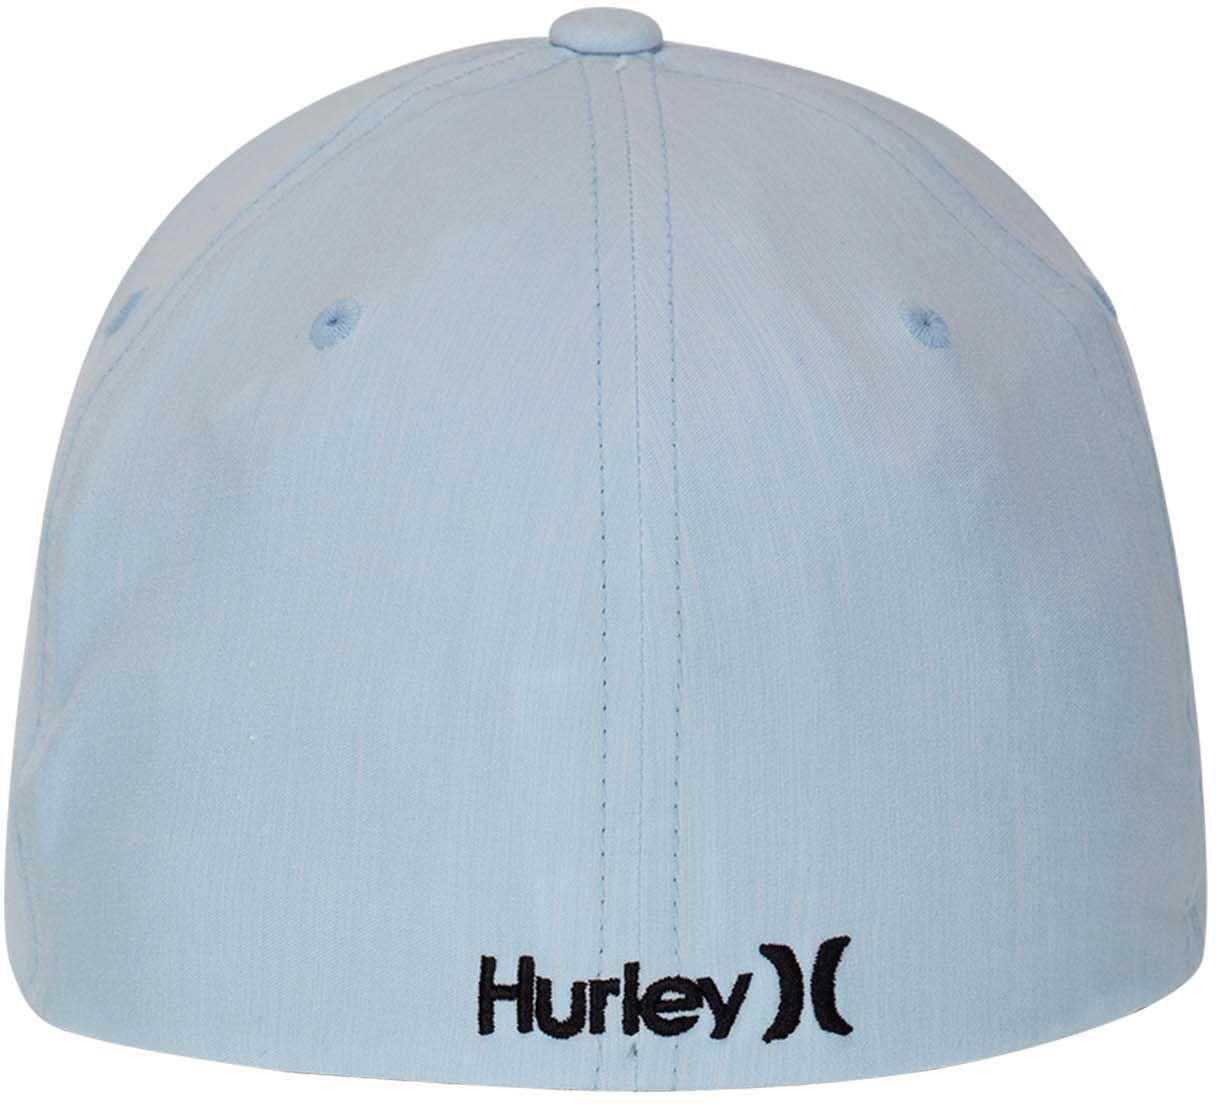 0b5d51859257b Hurley - Blue Dri-fit Cutback Hat for Men - Lyst. View fullscreen